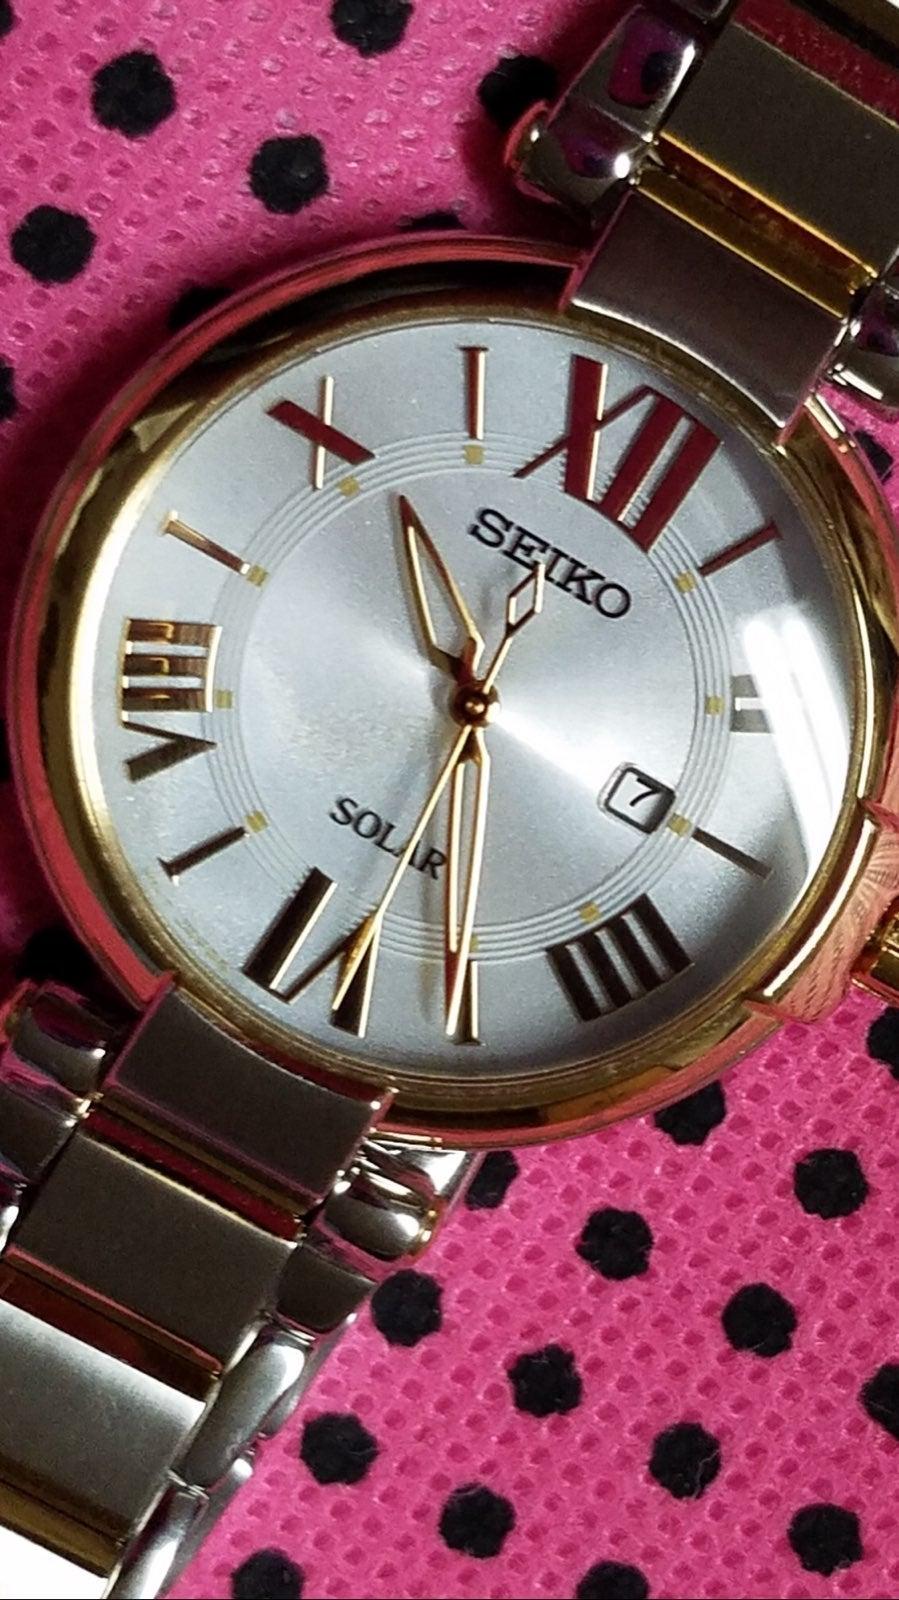 Seiko SUT154 Solar Stainless Steel Watch